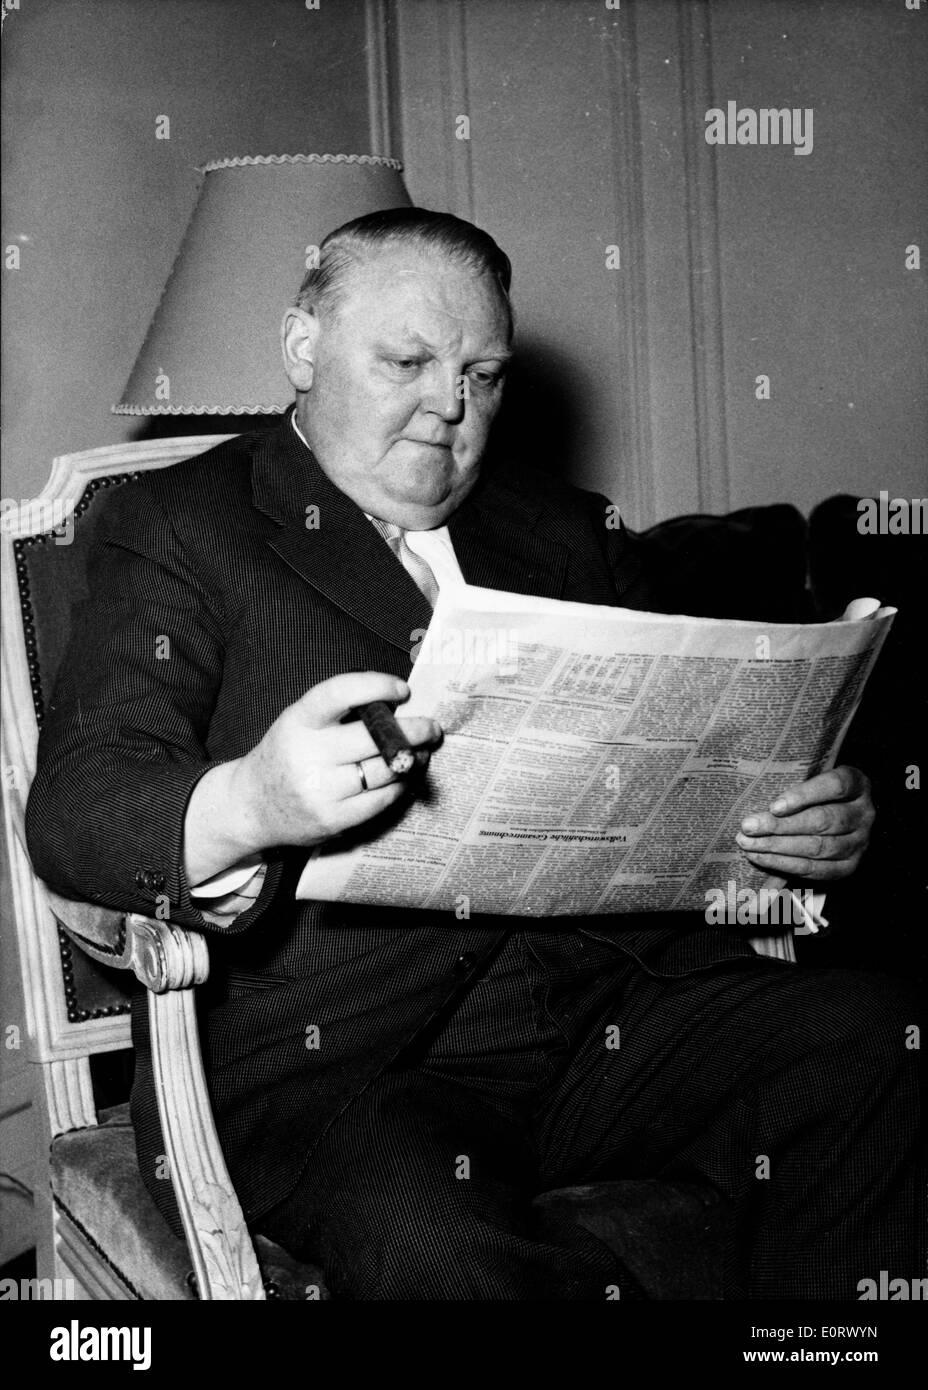 Ludwig Erhard reading the newspaper - Stock Image